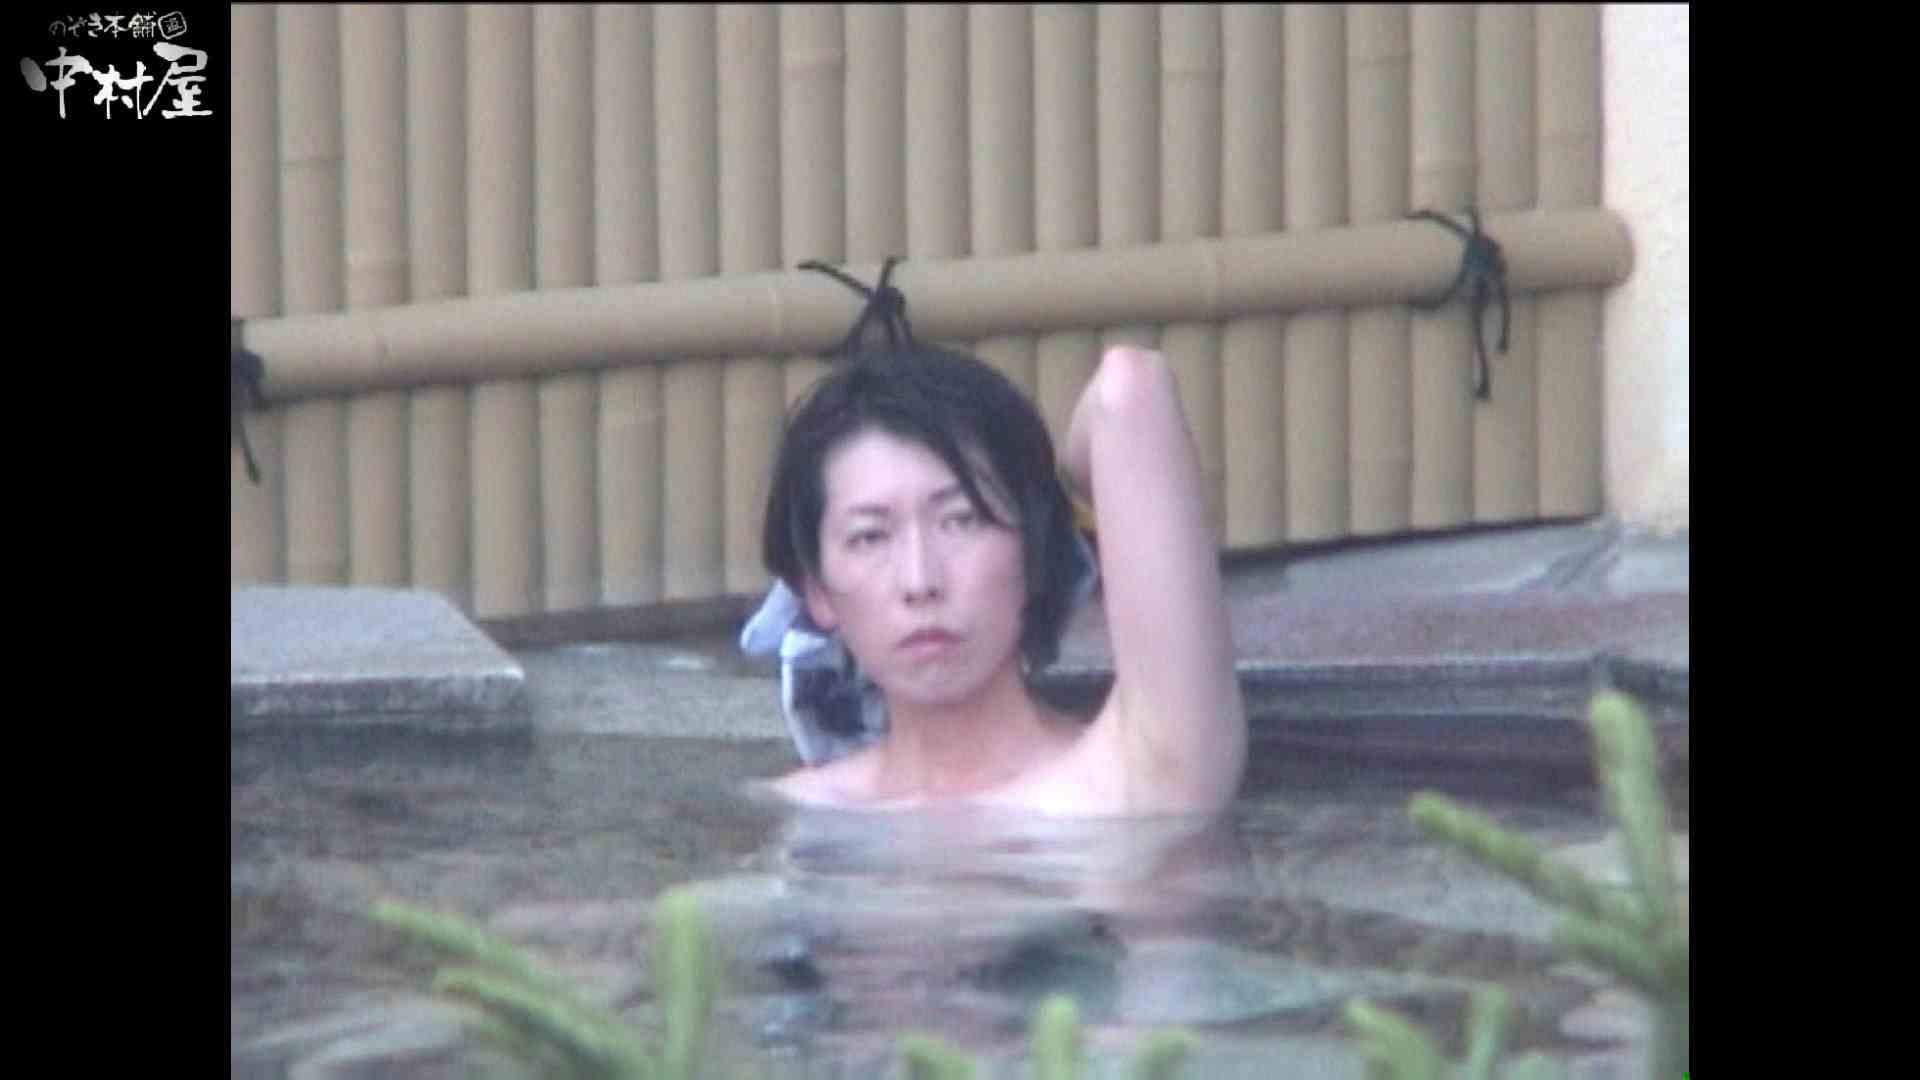 Aquaな露天風呂Vol.987 盗撮シリーズ | 露天風呂編  88PIX 11